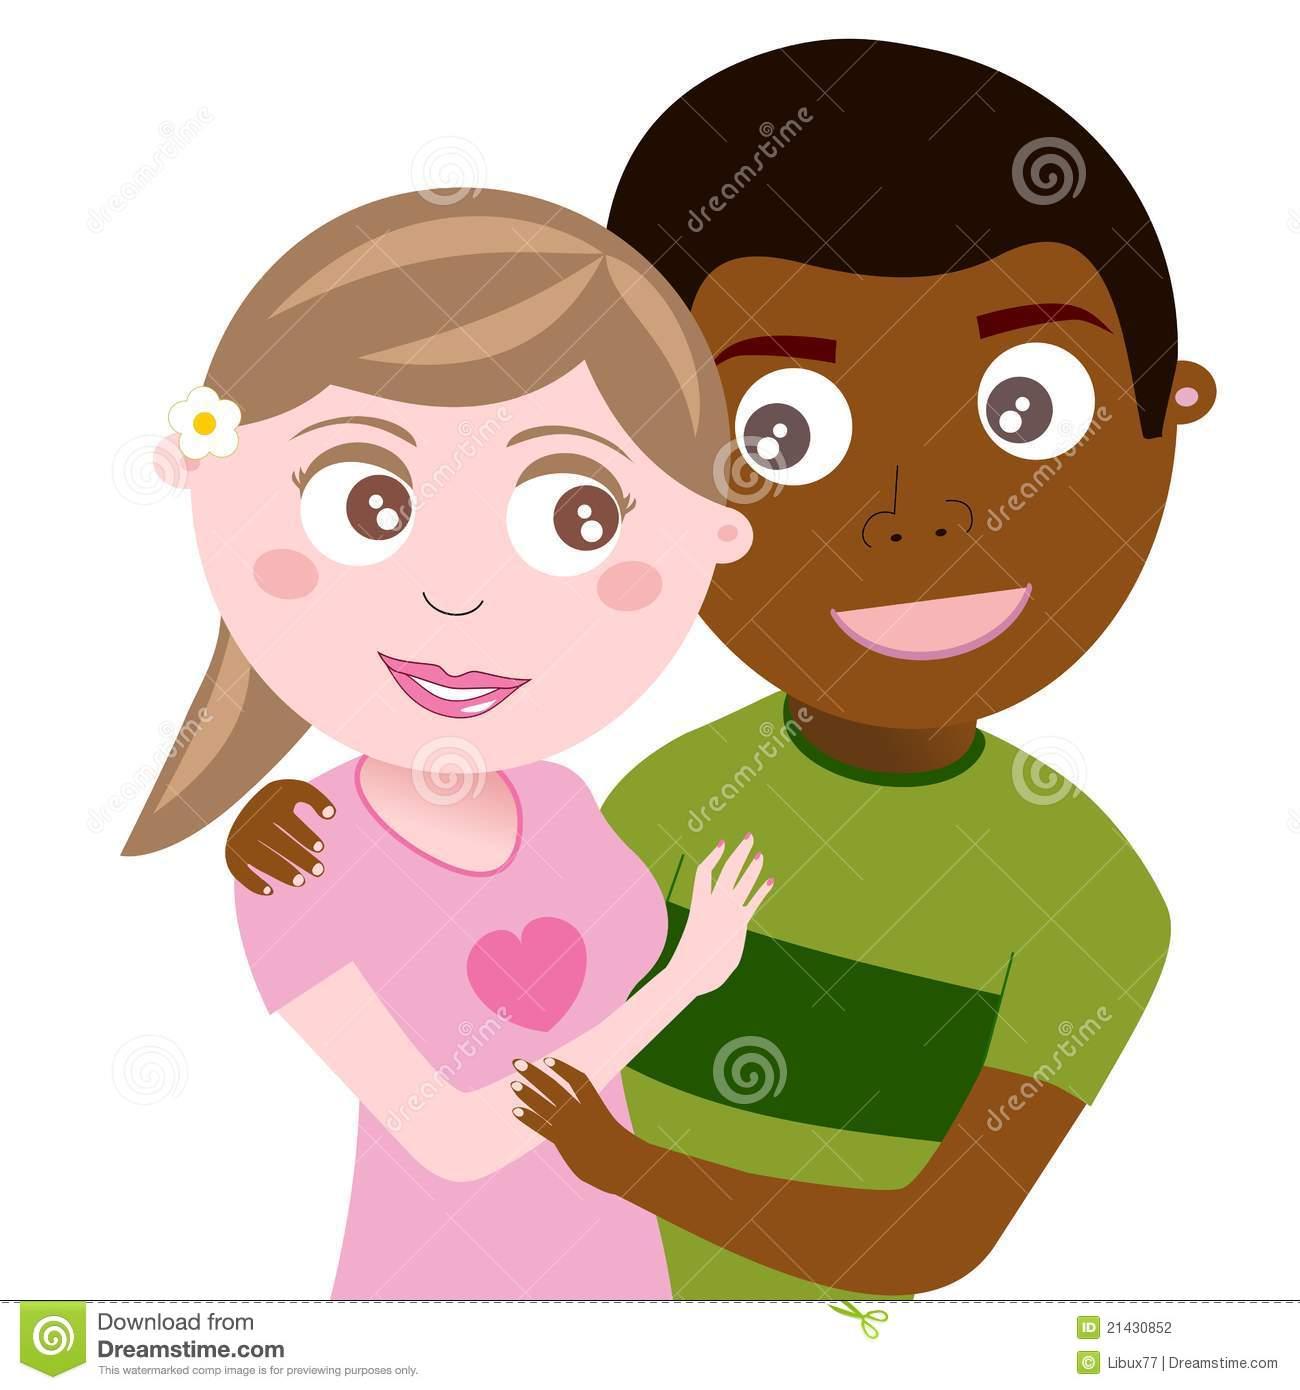 Interracial couple clipart vector royalty free library Happy Teenager Interracial Couple Hugging. Illustration Of A C ... vector royalty free library